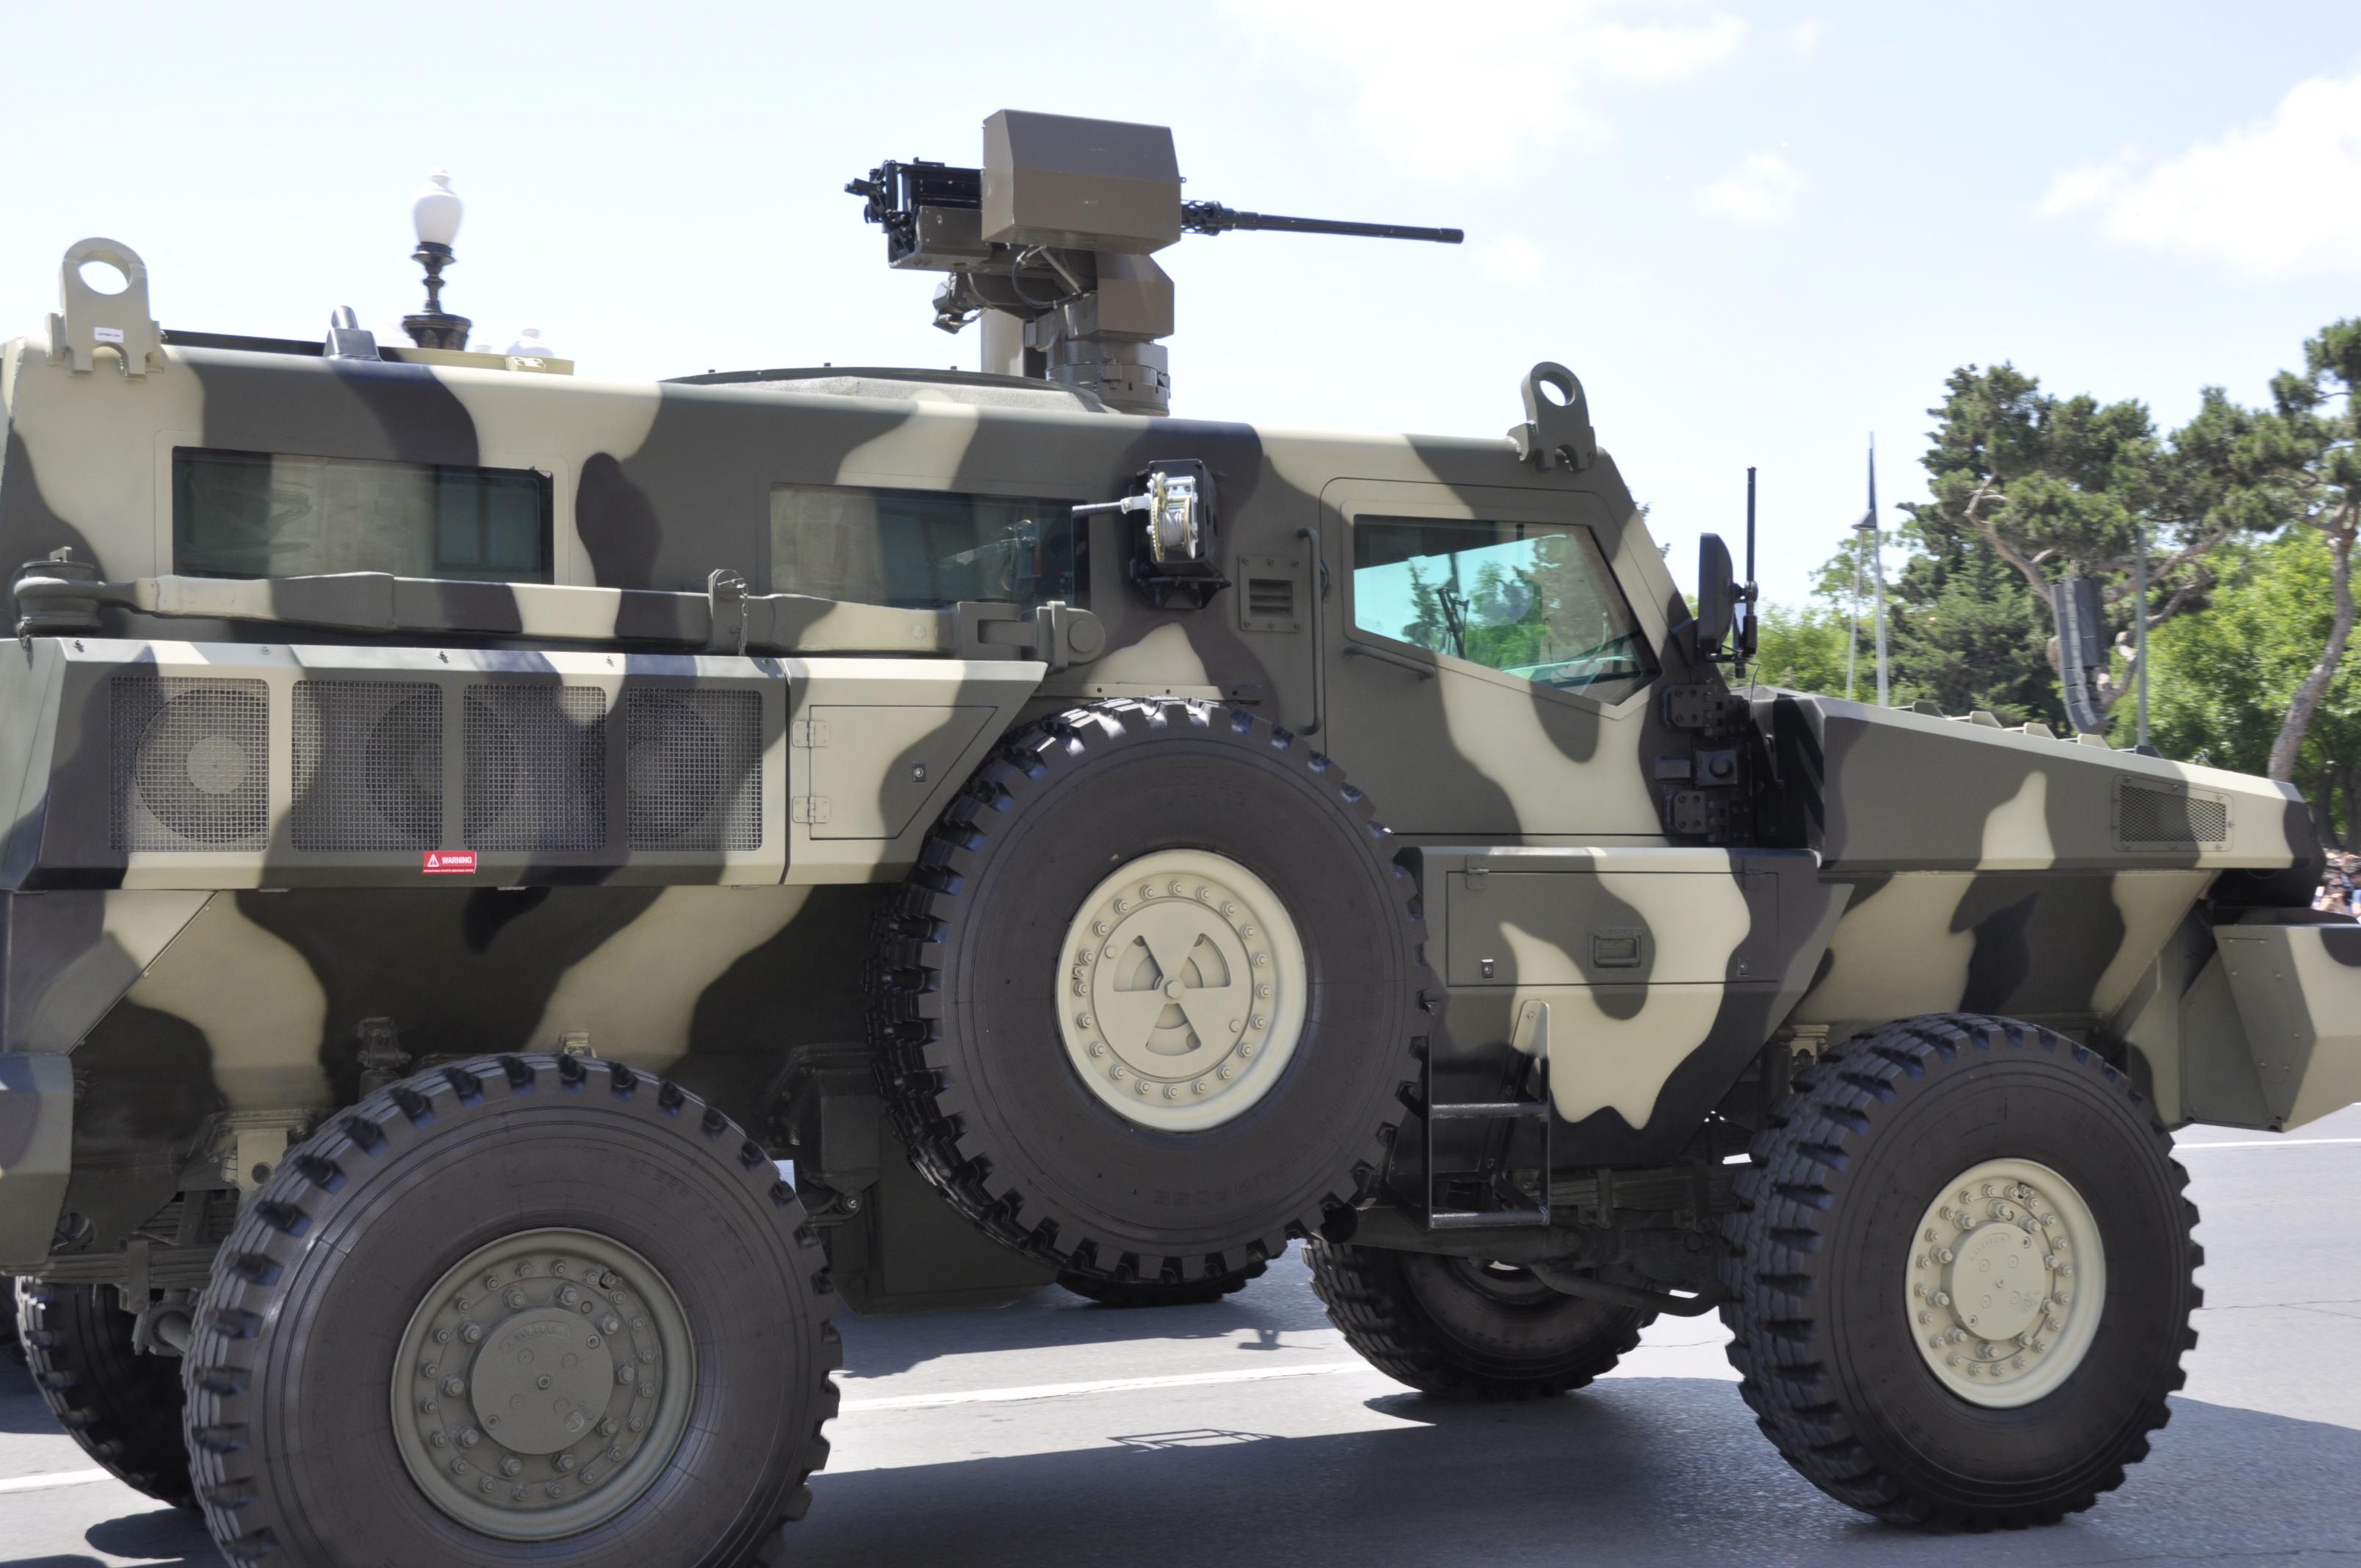 المانيا تمنح تونس 10 ملايين يورو لشراء مدرعات من نوع ''ماردر'' Military_parade_in_Baku_on_an_Army_Day7